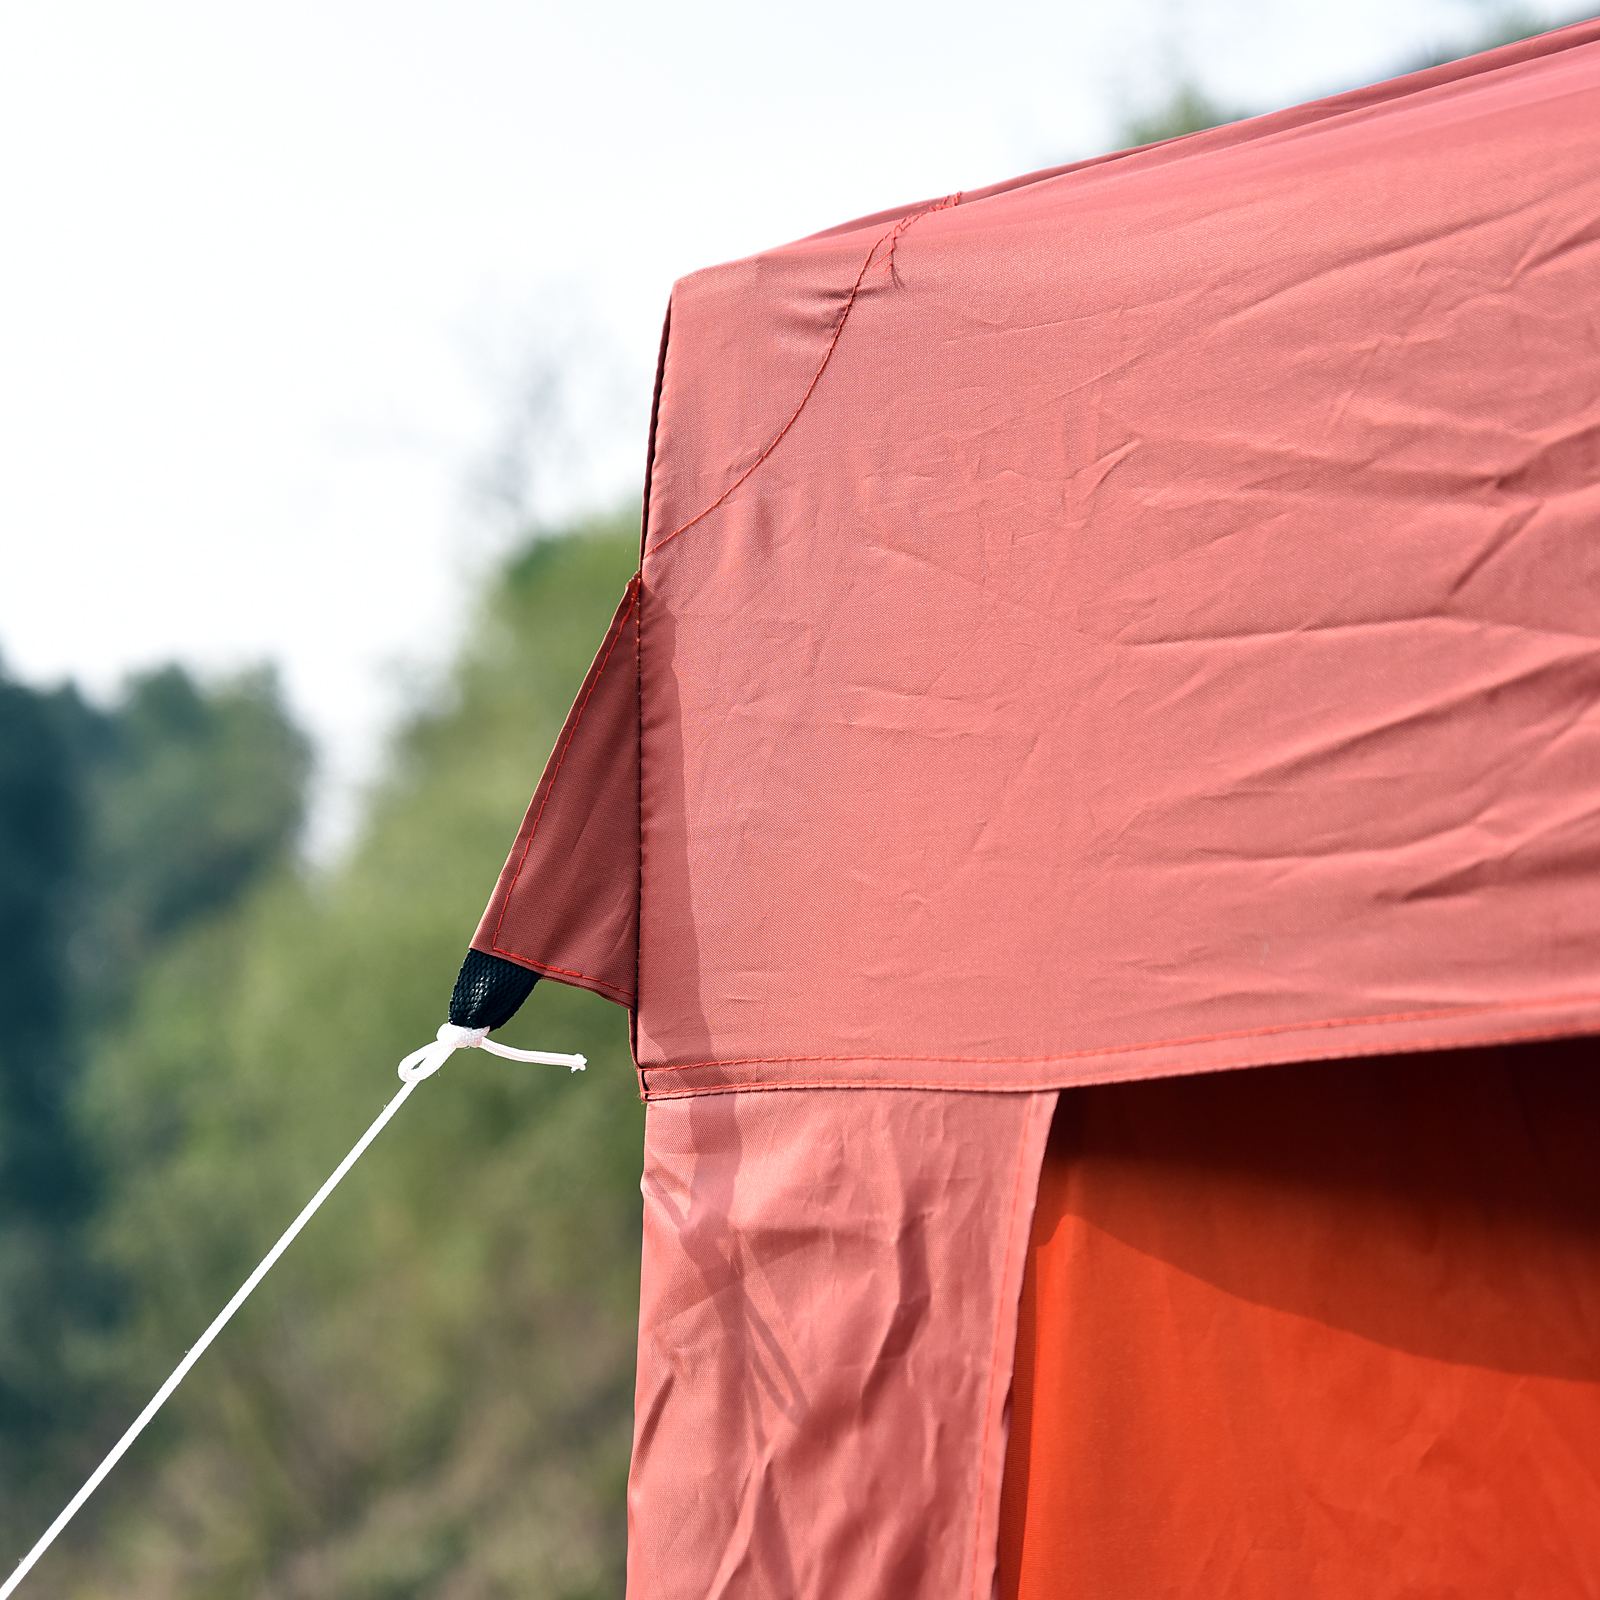 Outdoor-10-039-x20-039-EZ-POP-UP-Gazebo-Wedding-Party-Tent-Canopy-Folding-w-Carry-Bag thumbnail 38